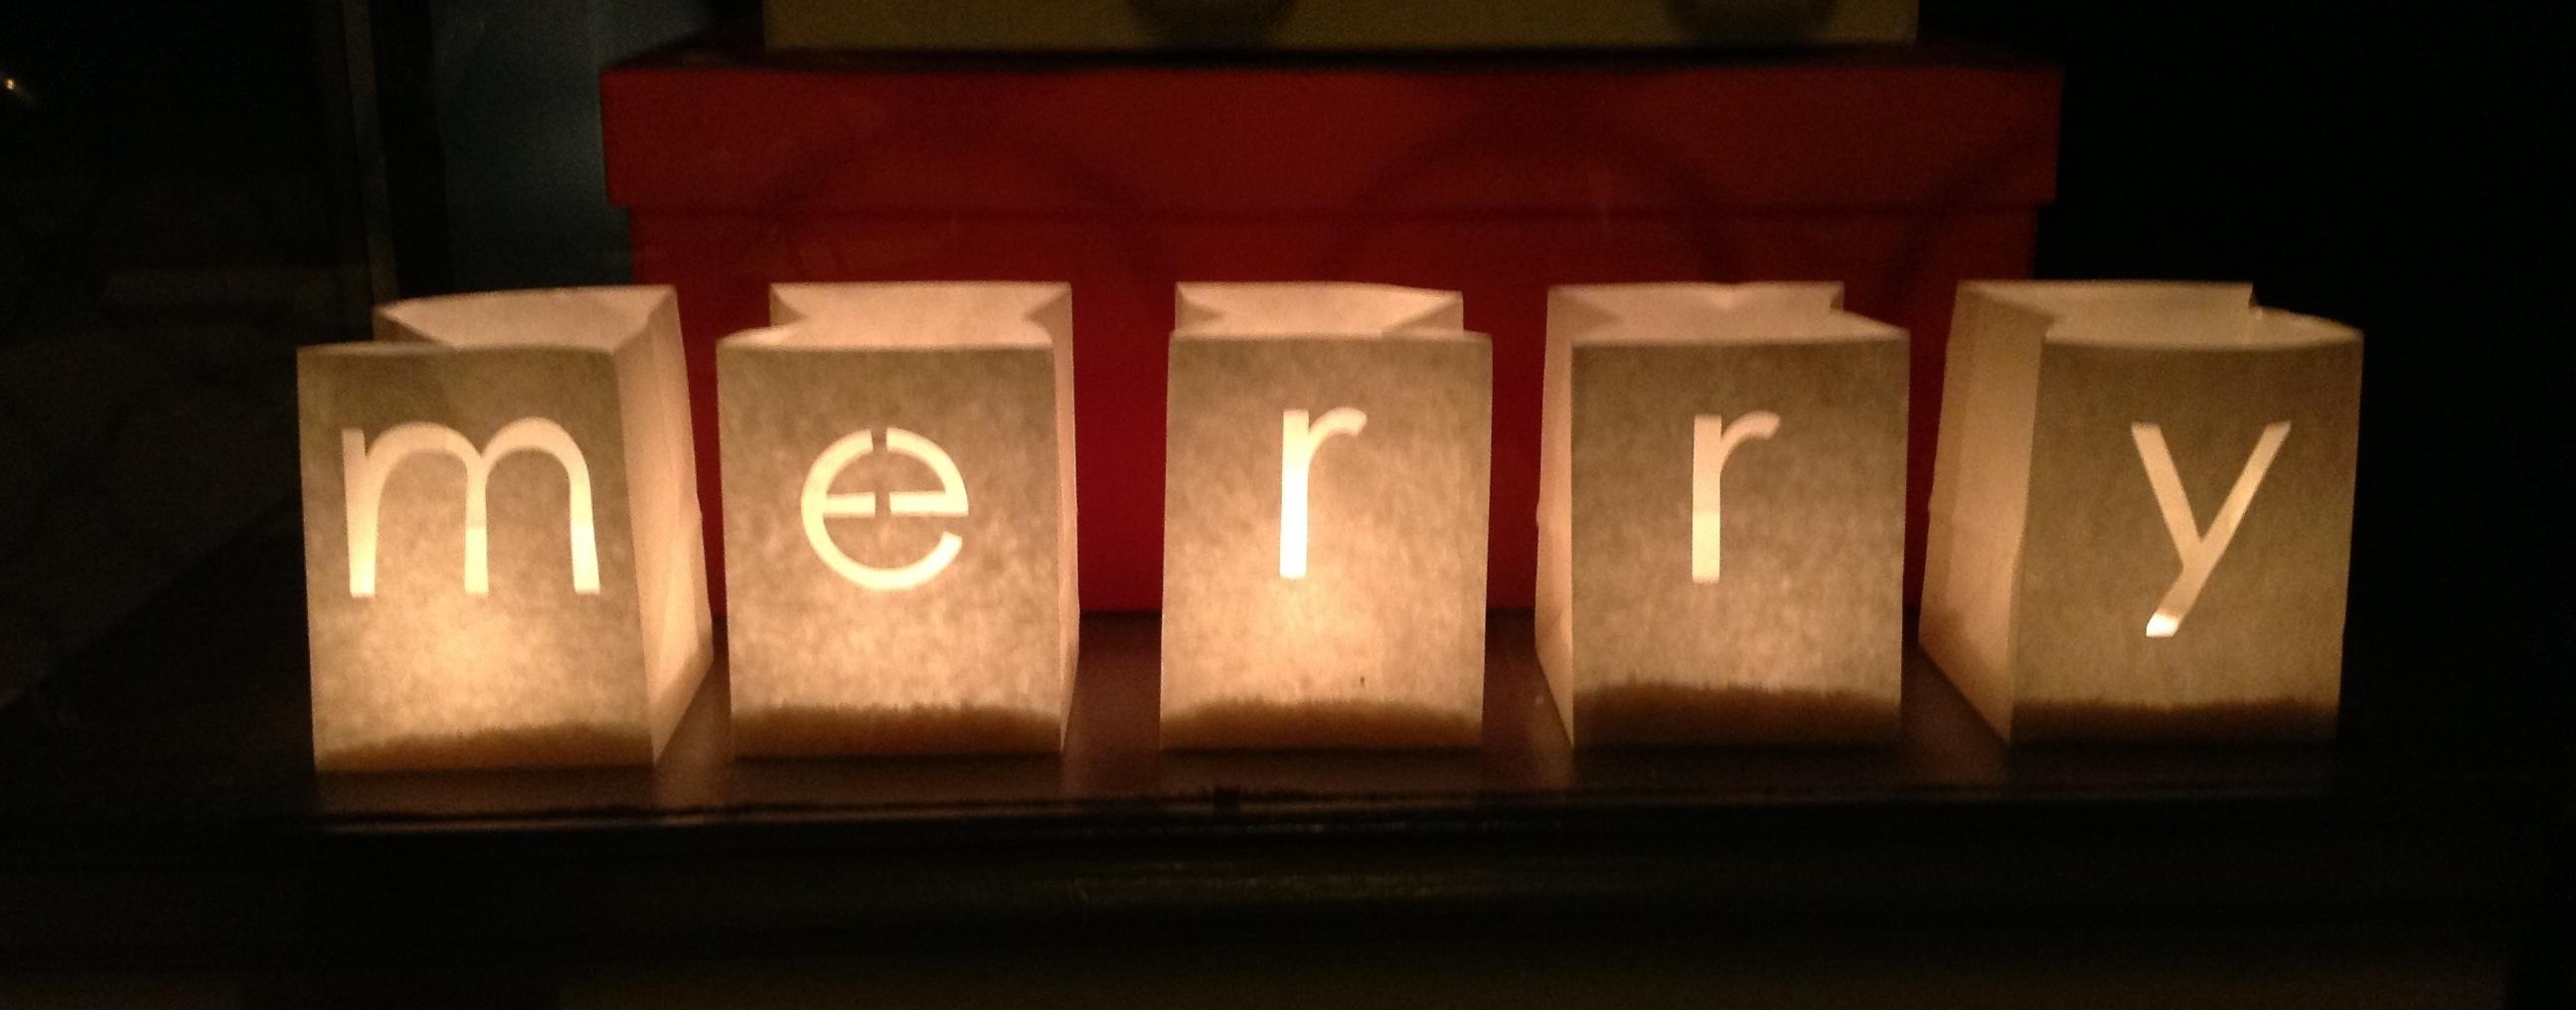 Post de navidad 2da parte tinta gris - Porta velas navidenas ...